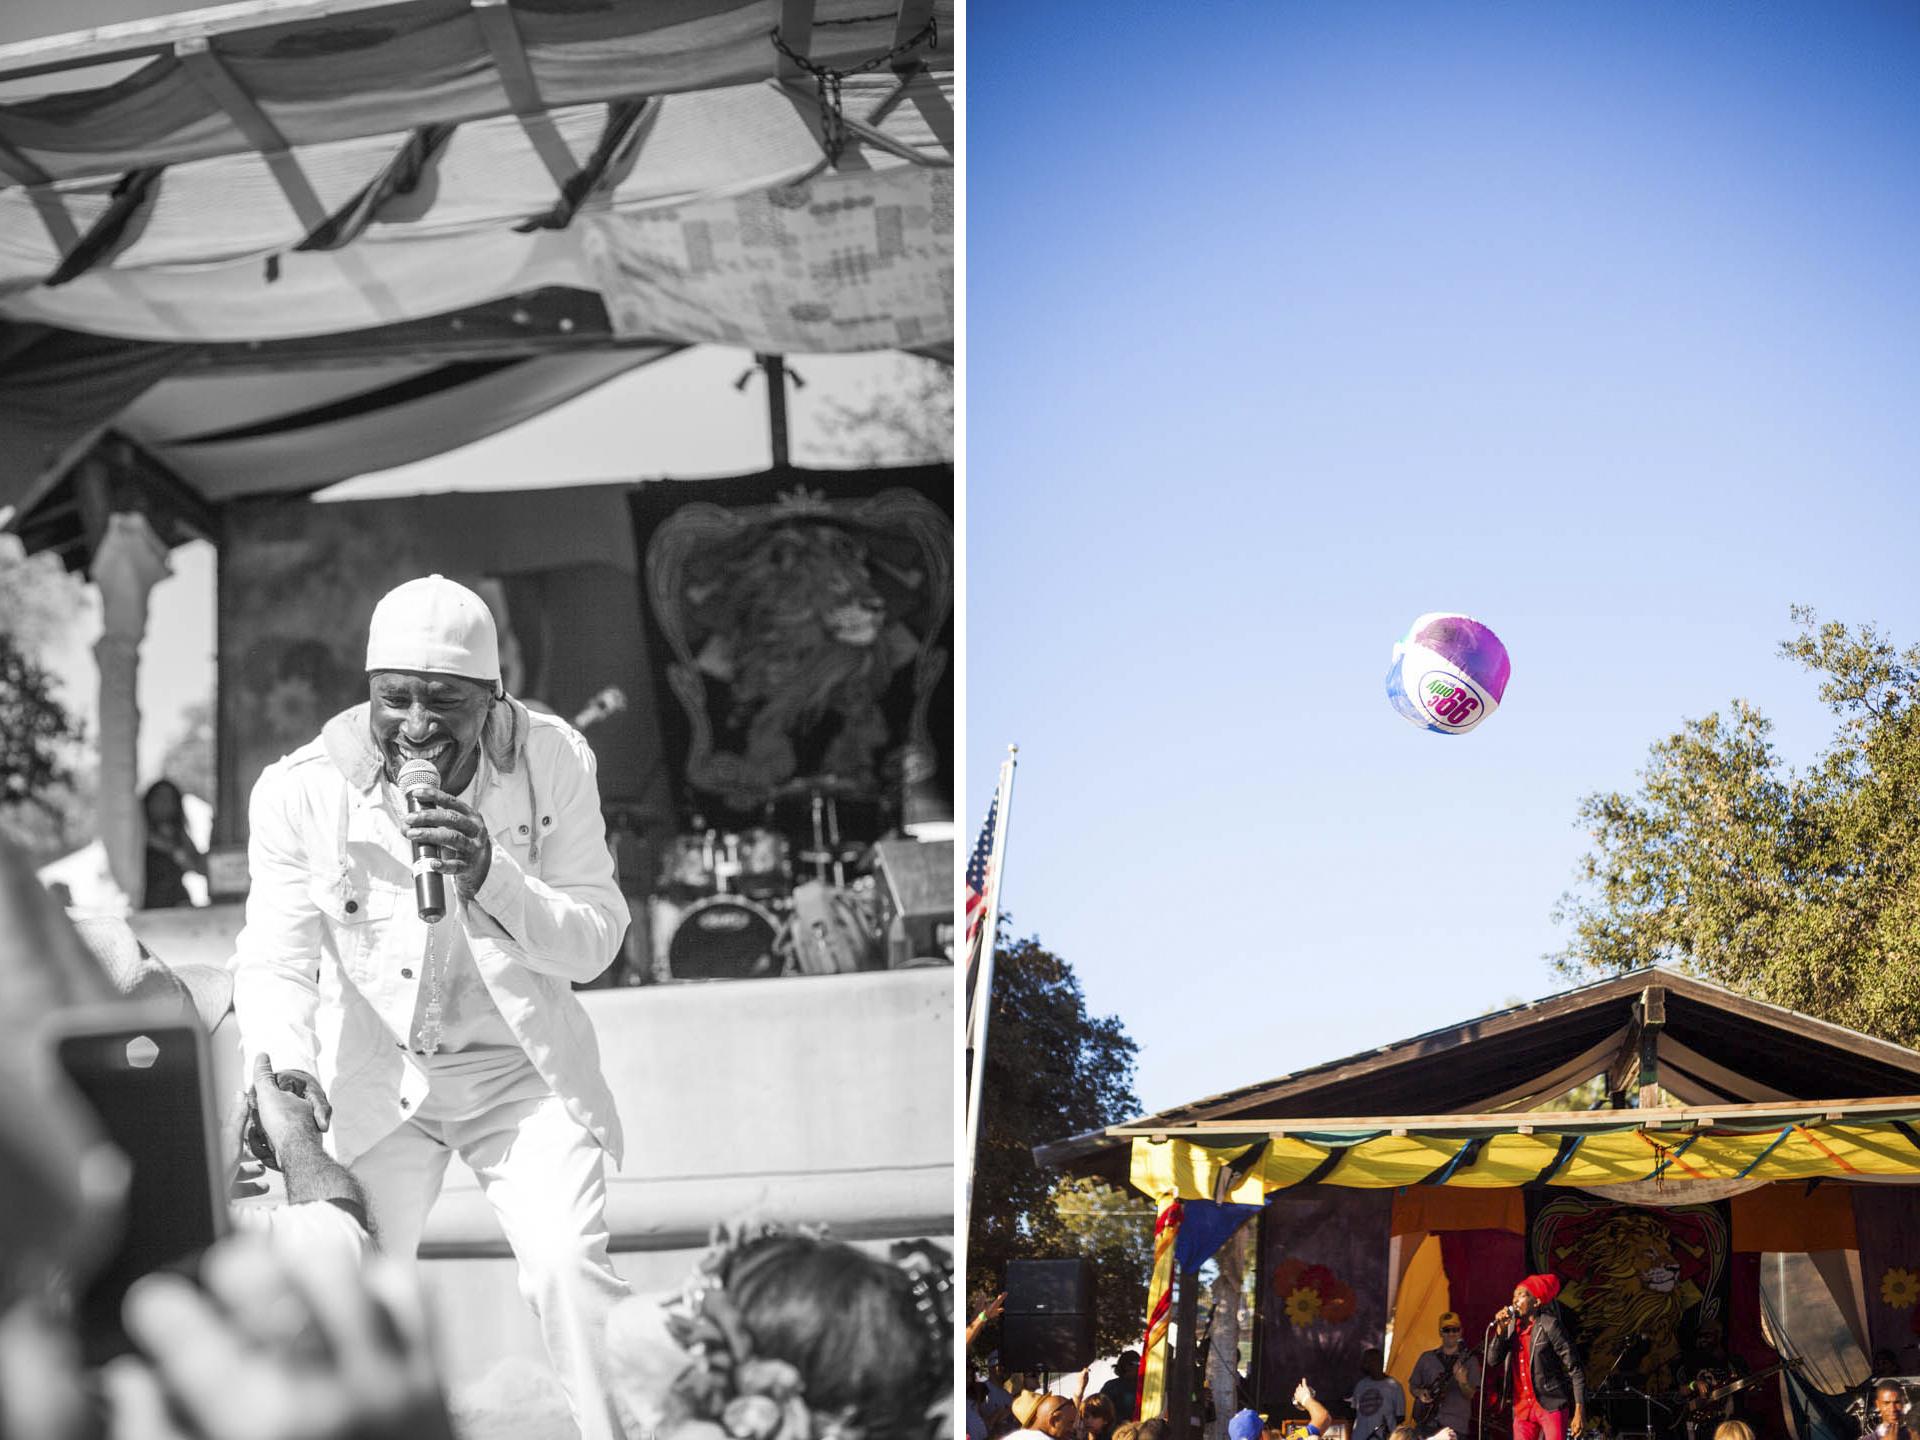 reggae+pon+the+mountain+2013+16.jpg